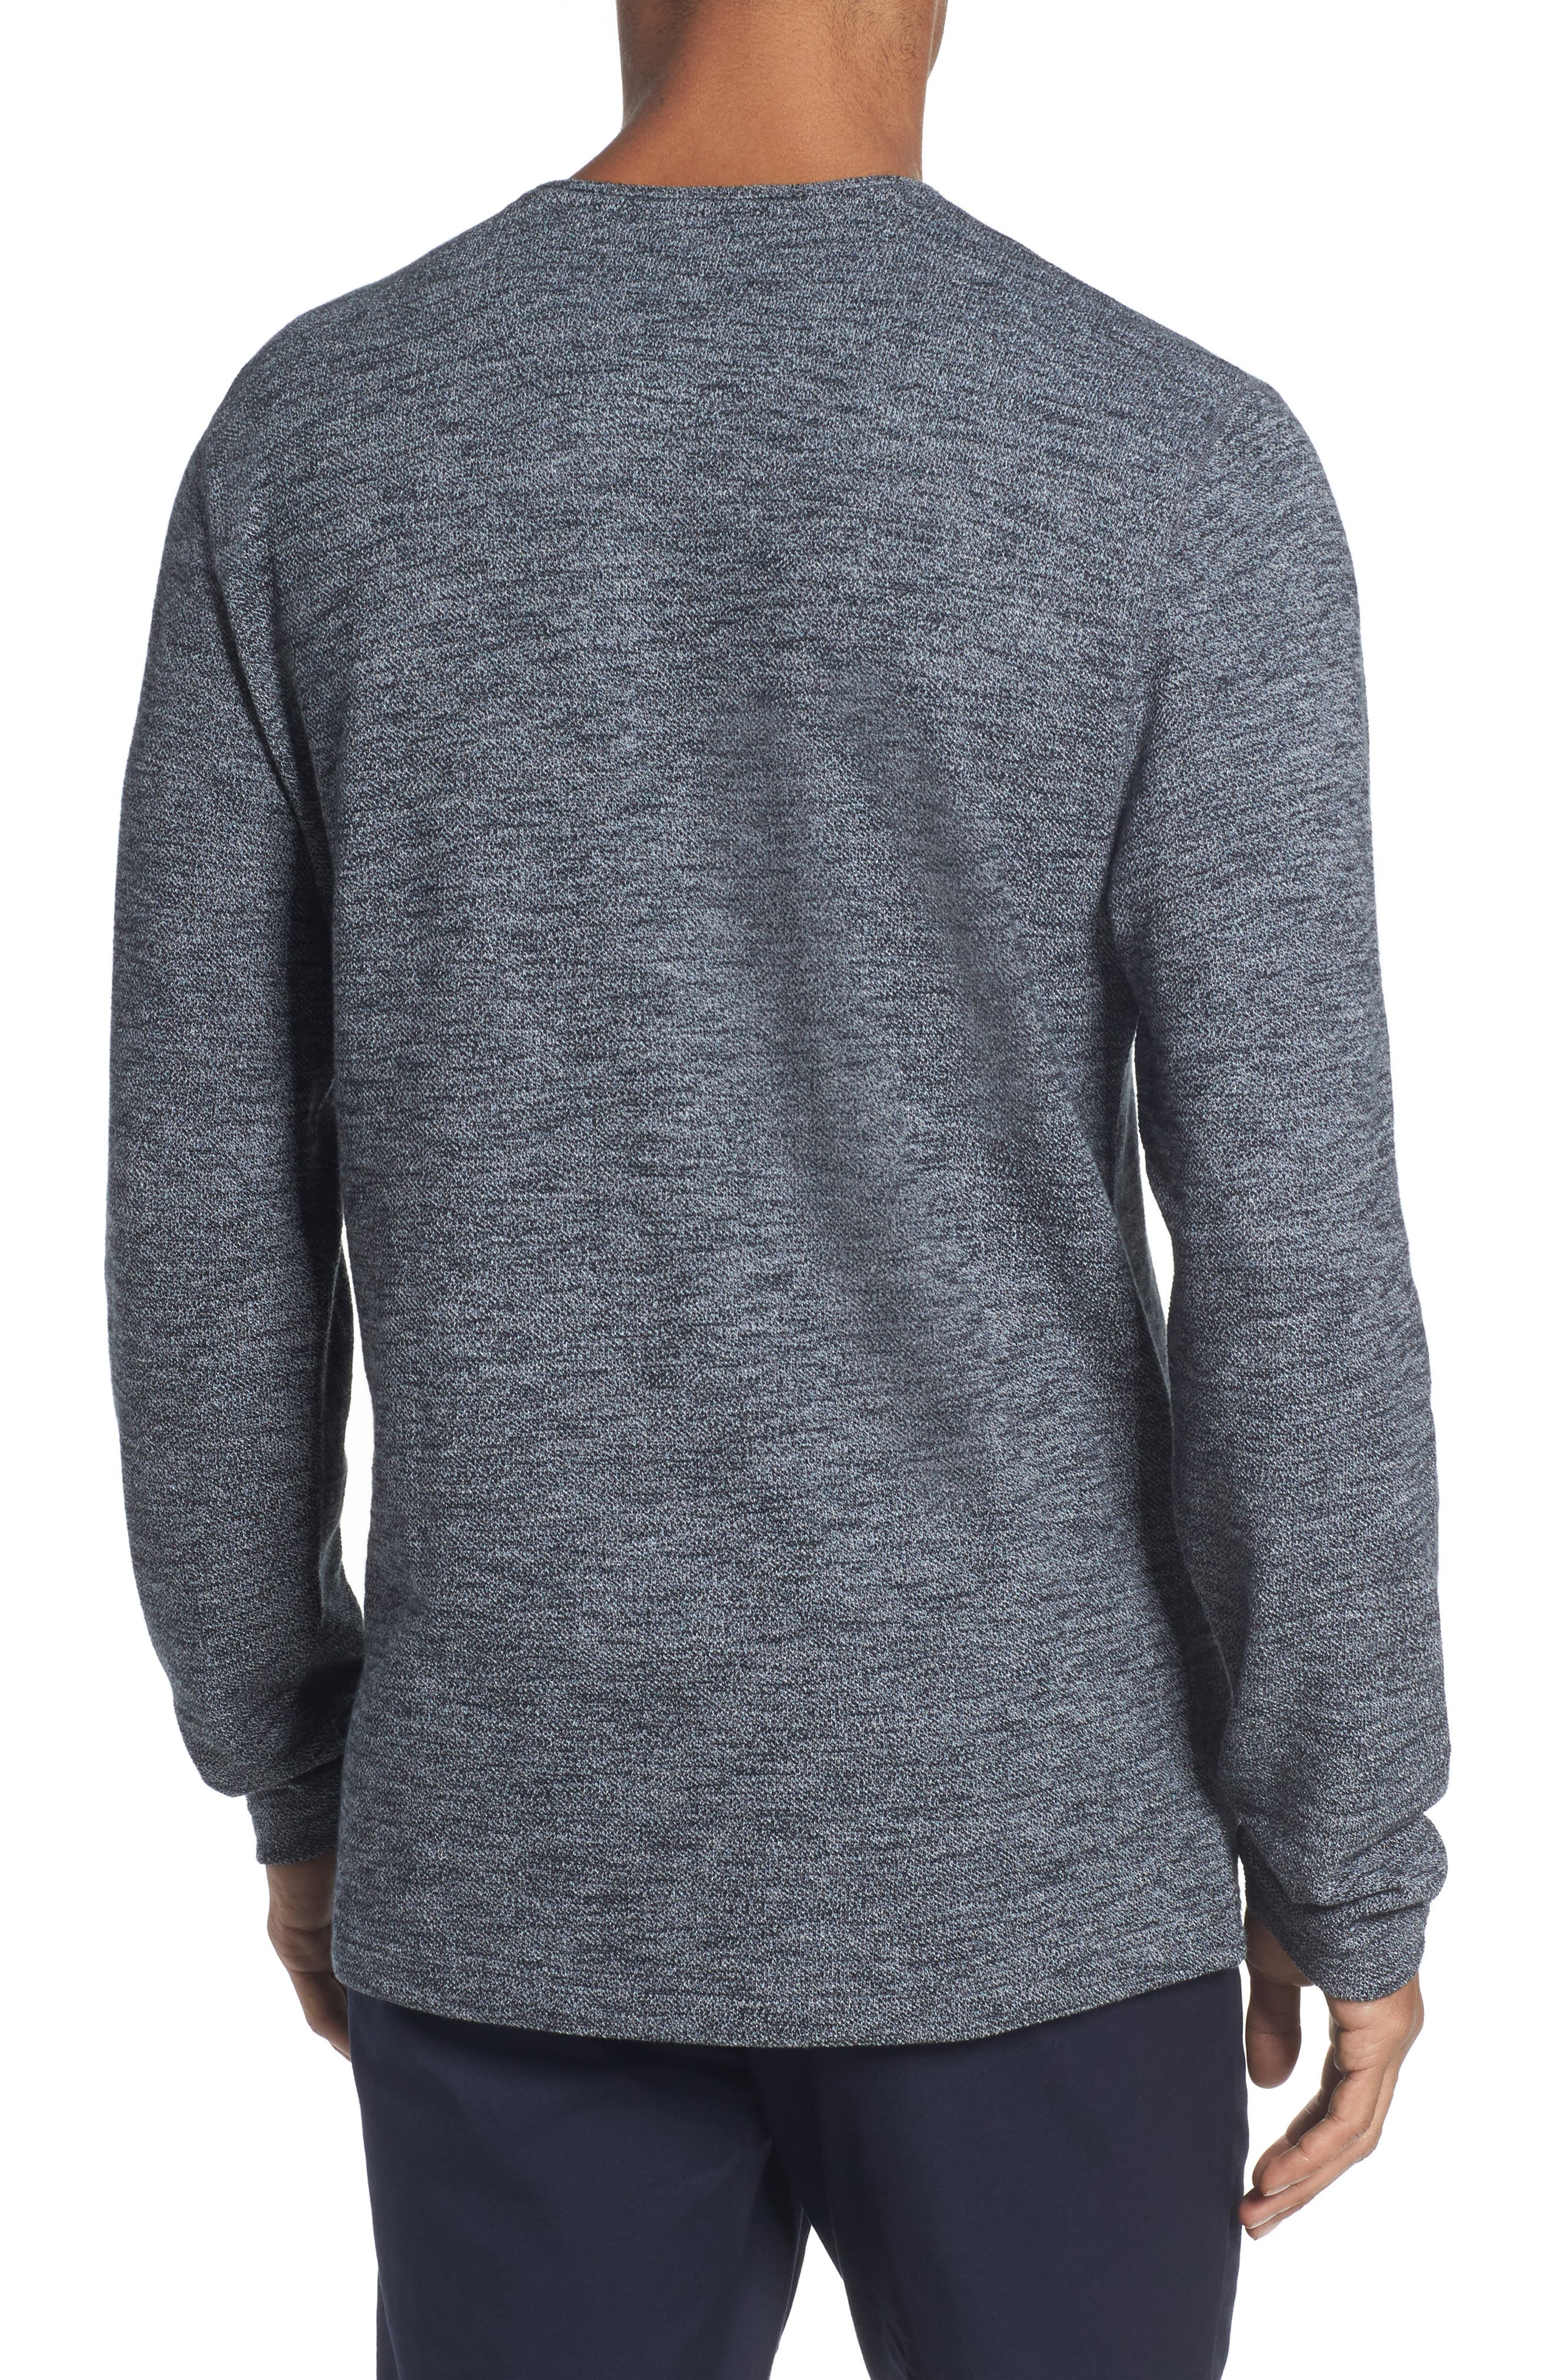 Alternate Image 3  - Nordstrom Men's Shop Hacci Knit Henley (Tall)